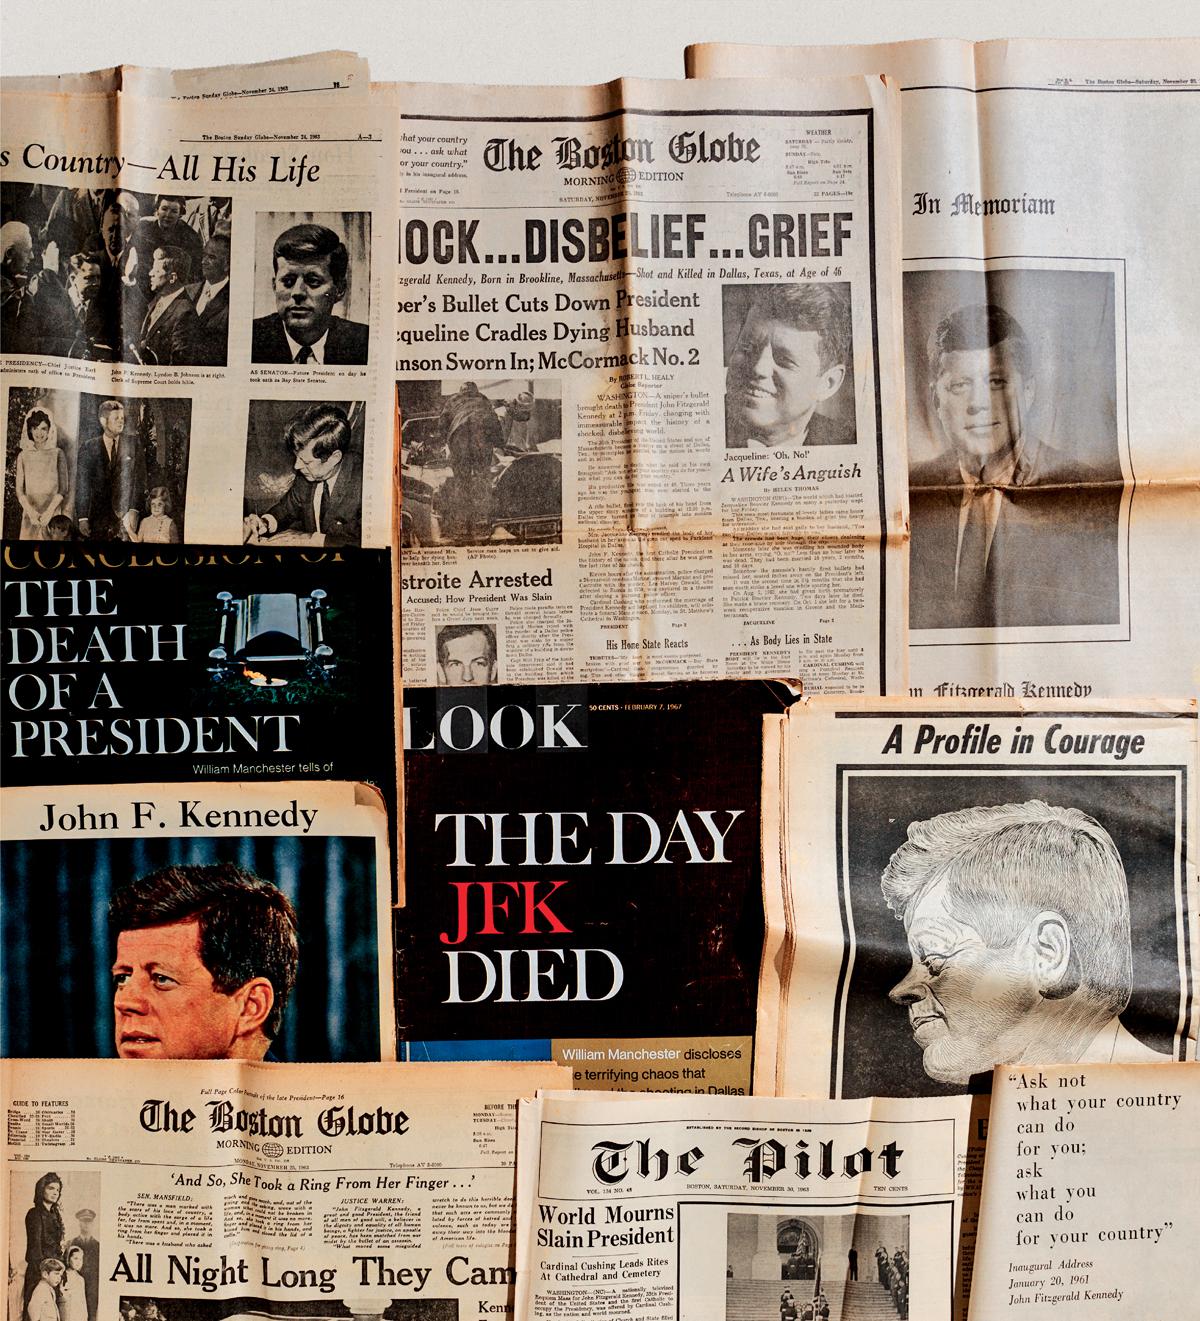 jfk-assassination-50th-anniversary-boston-1